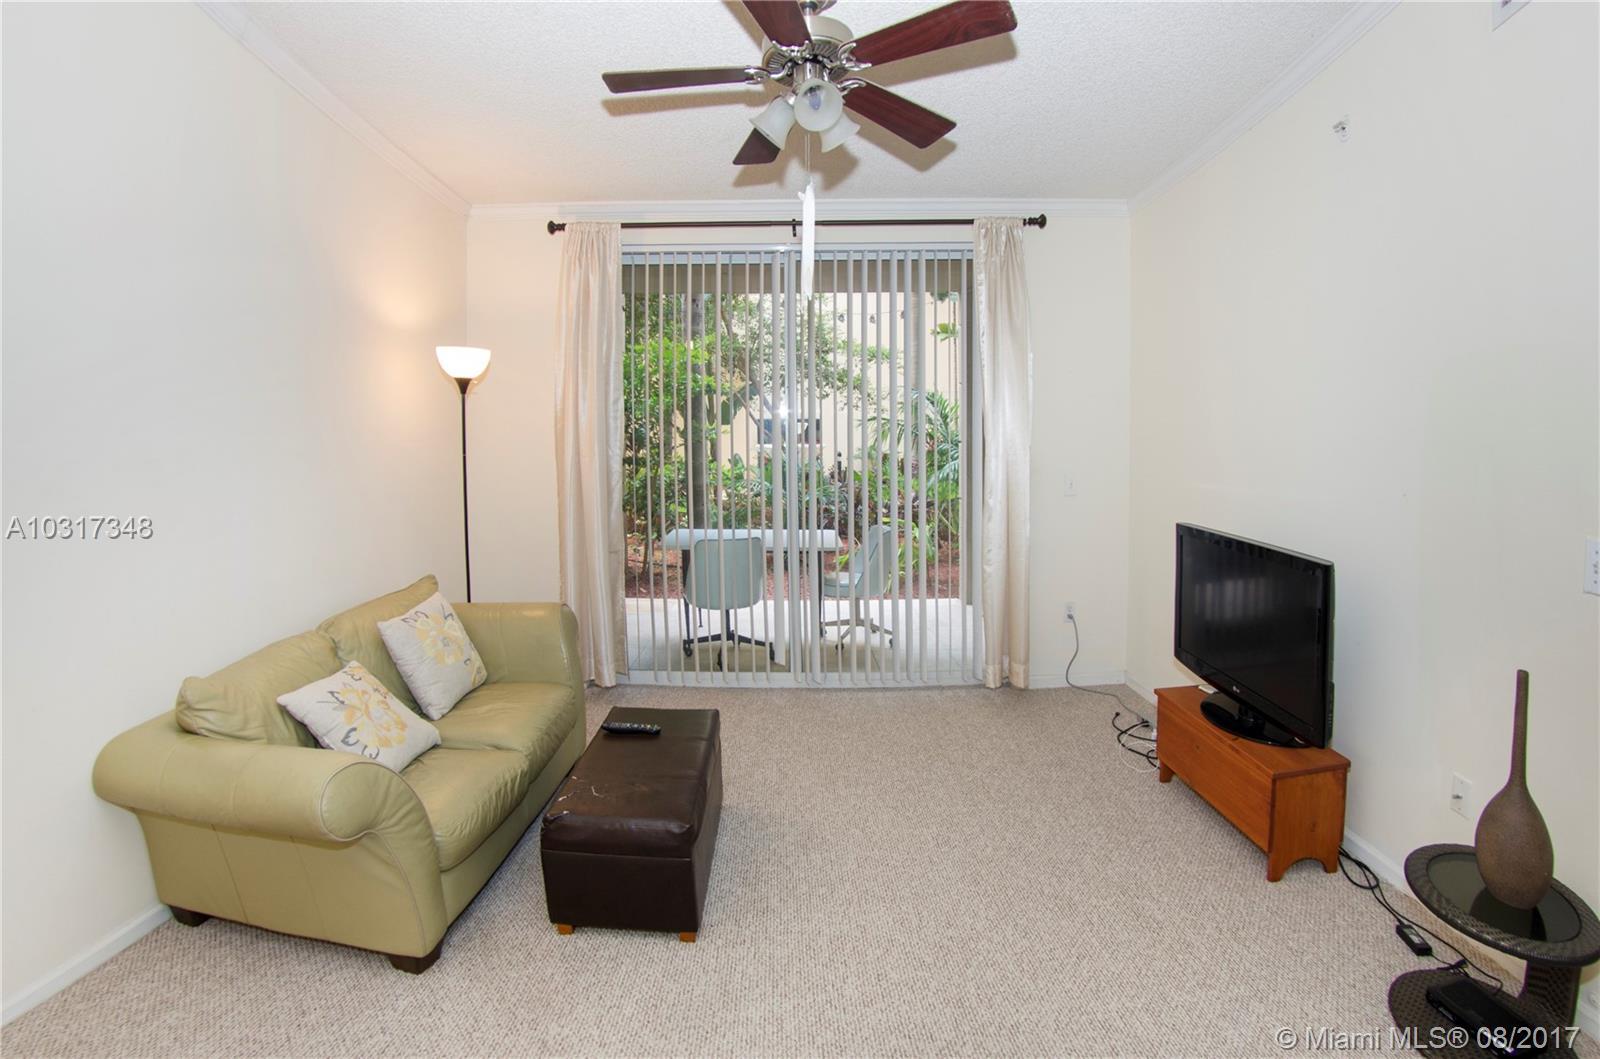 17150 N Bay Rd # 2119, Sunny Isles Beach, FL 33160